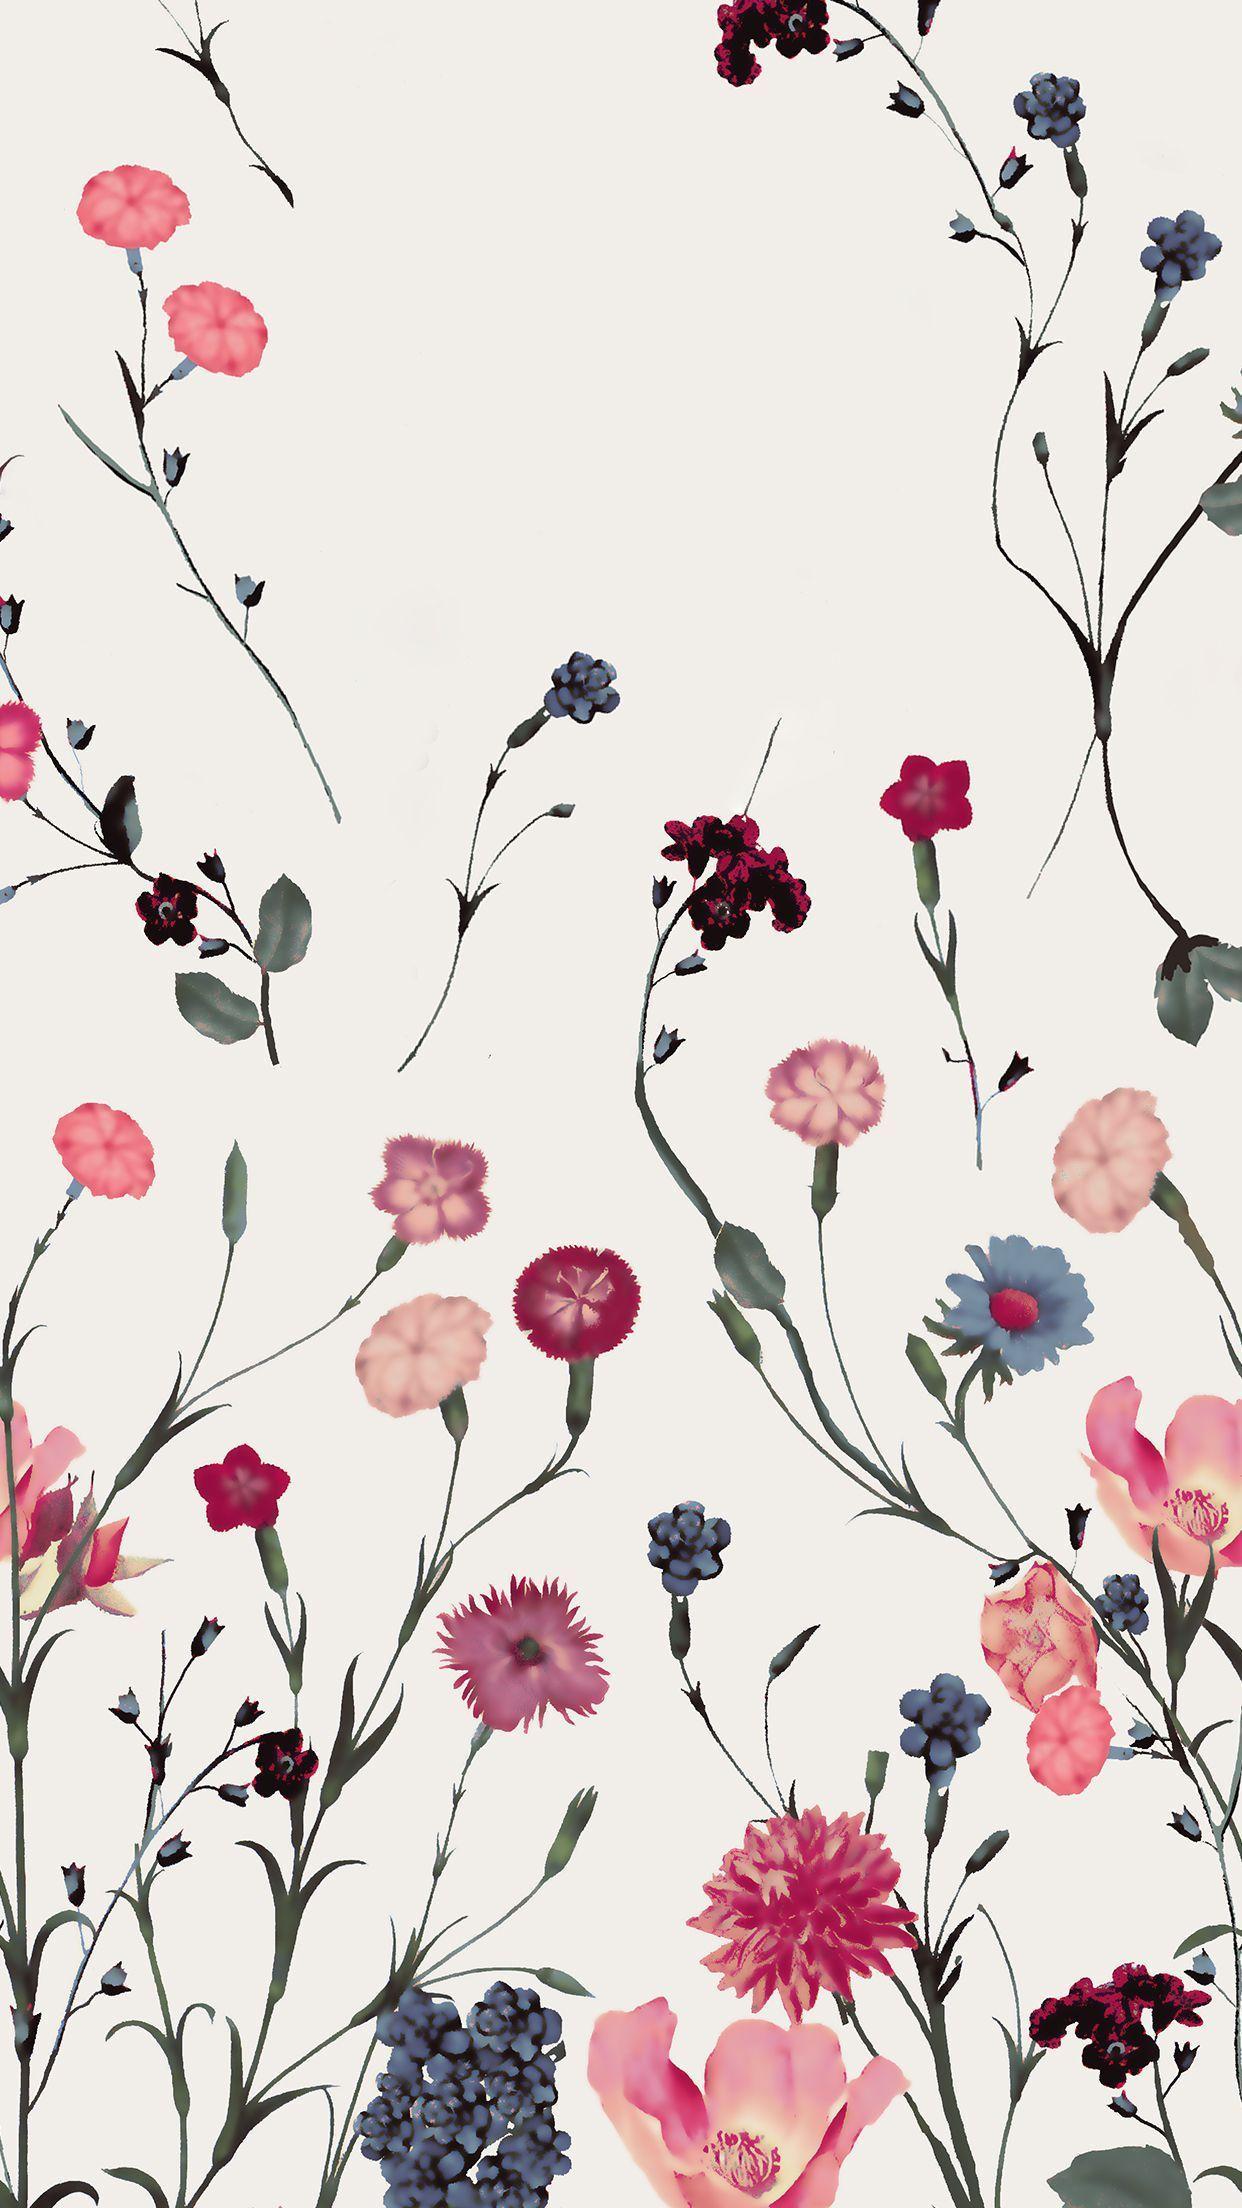 Vintage Floral Iphone Wallpapers Top Free Vintage Floral Iphone Backgrounds Wallpaperaccess